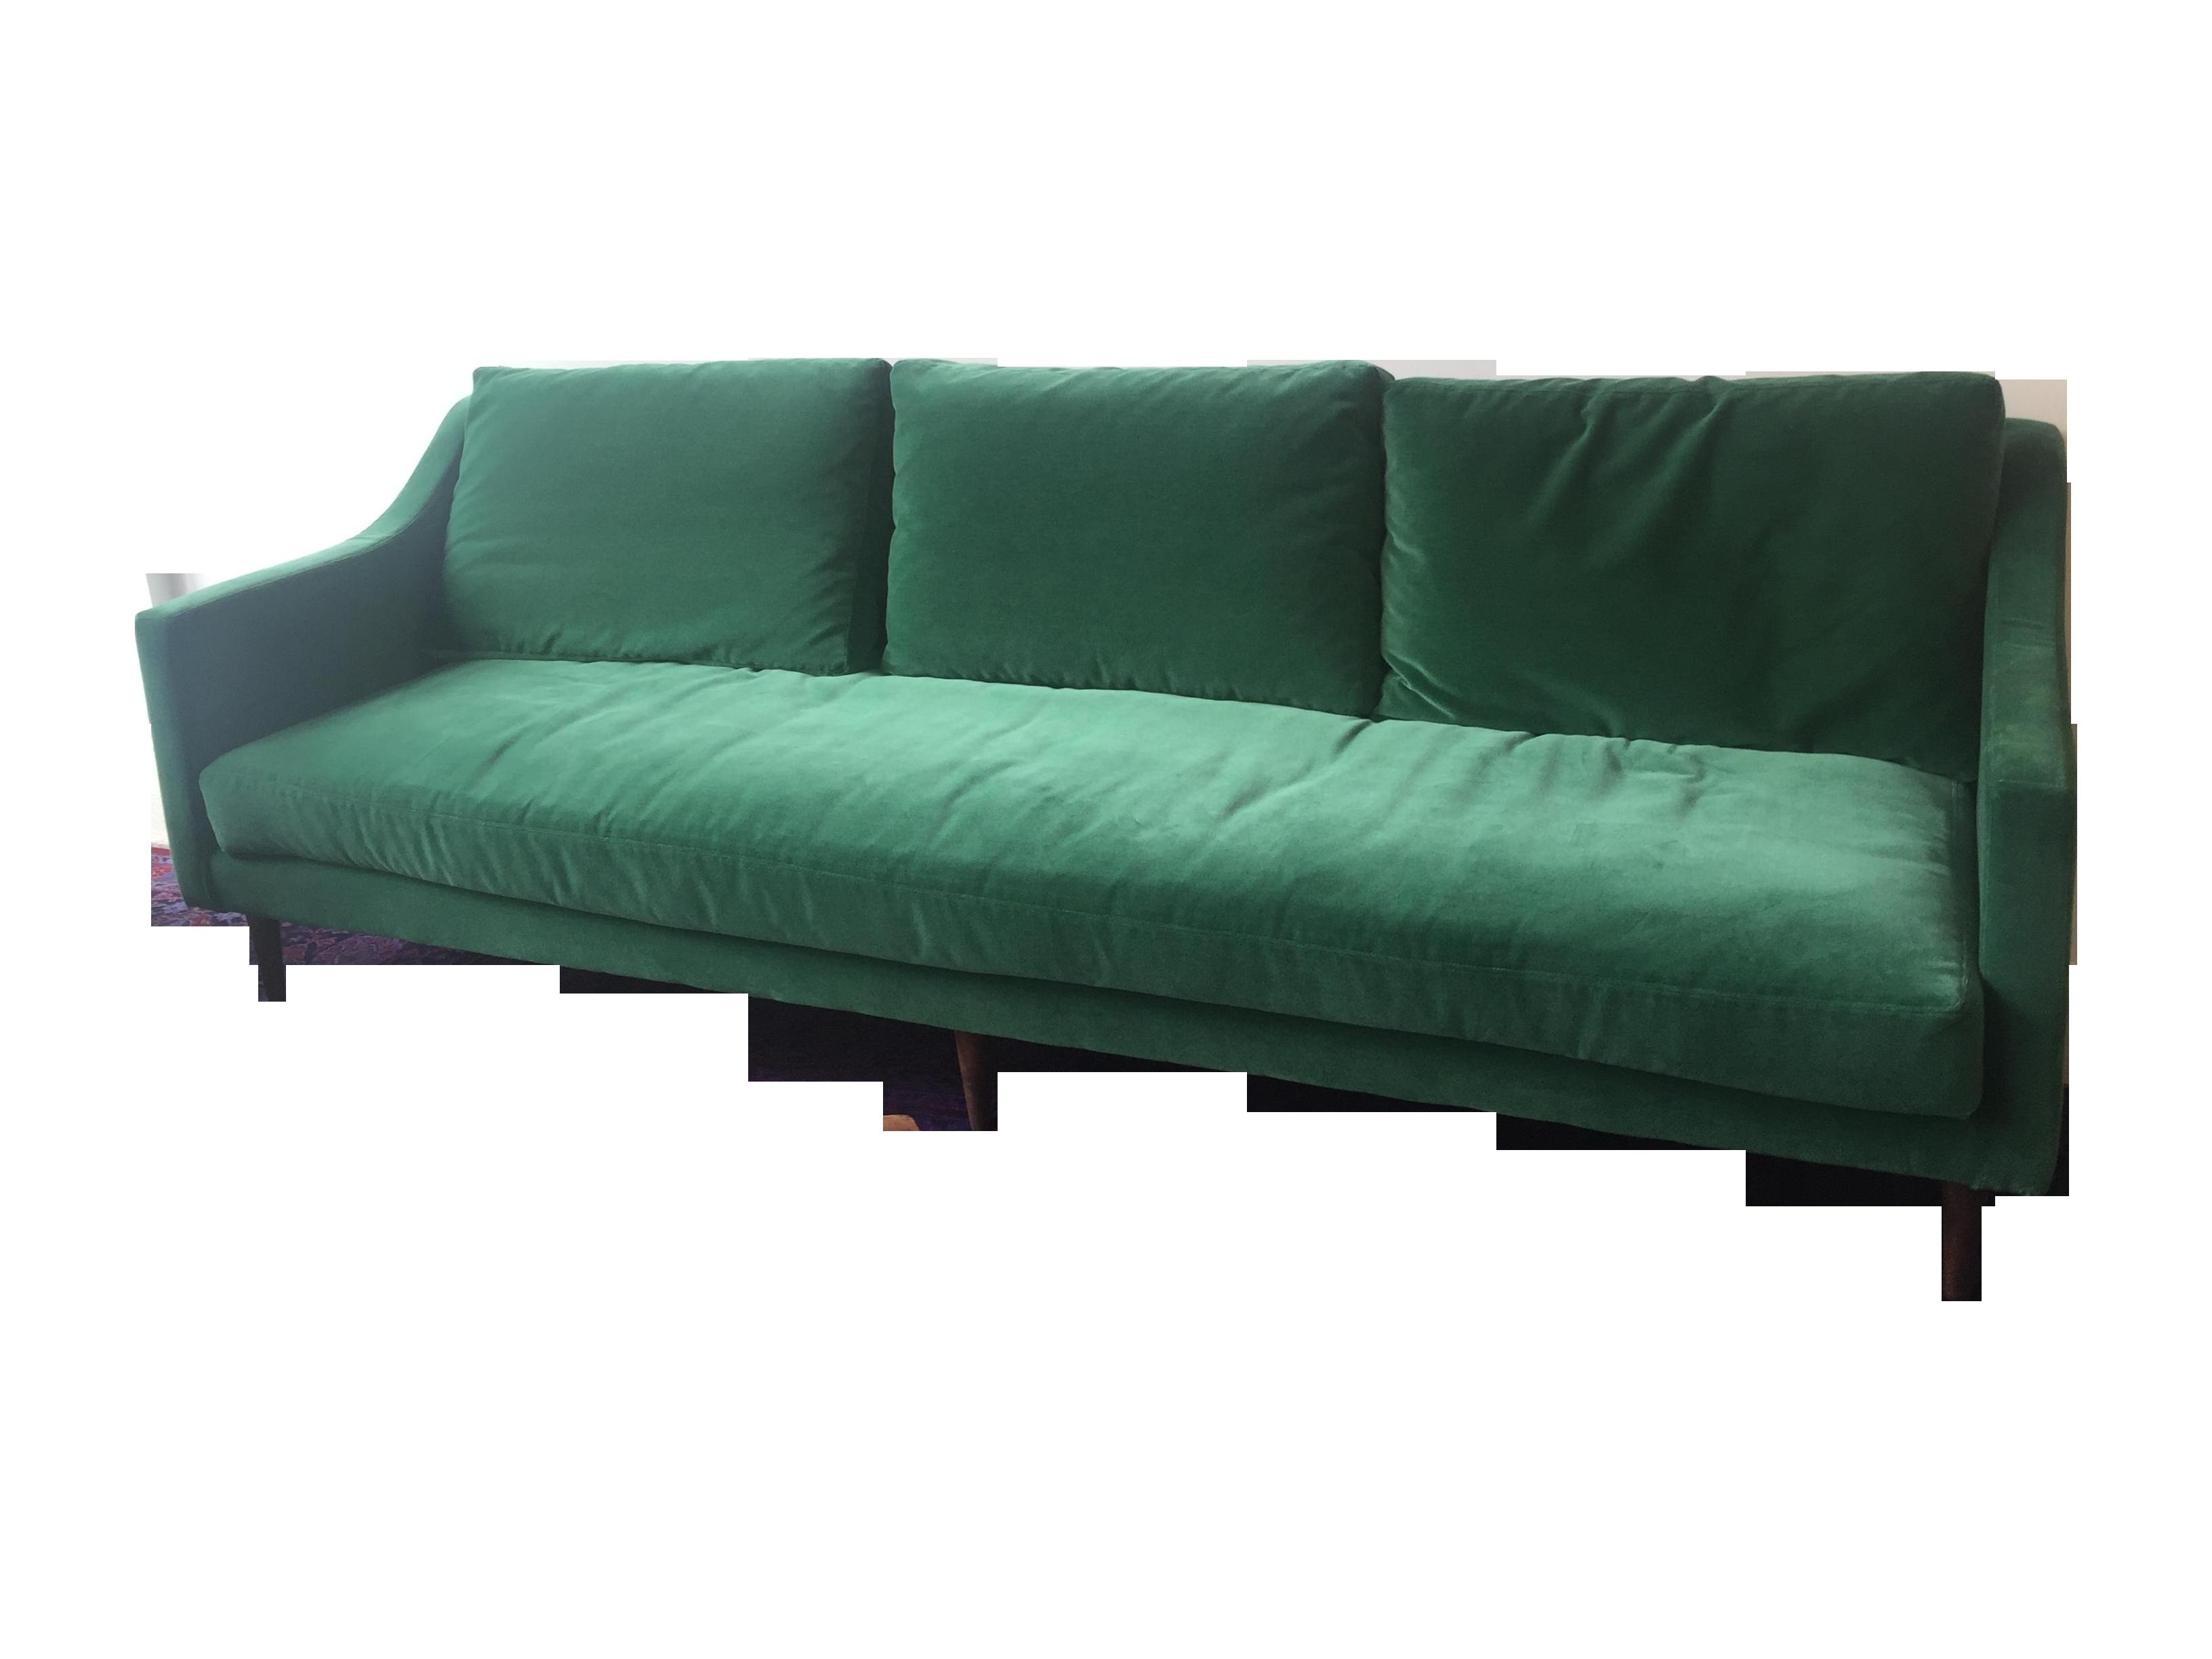 Naples Mid Century Modern Green Velvet Sofa Chairish : c1c82b6e 41b1 4072 87ac 3d17d022ea6faspectfitampwidth640ampheight640 from www.chairish.com size 640 x 640 jpeg 22kB